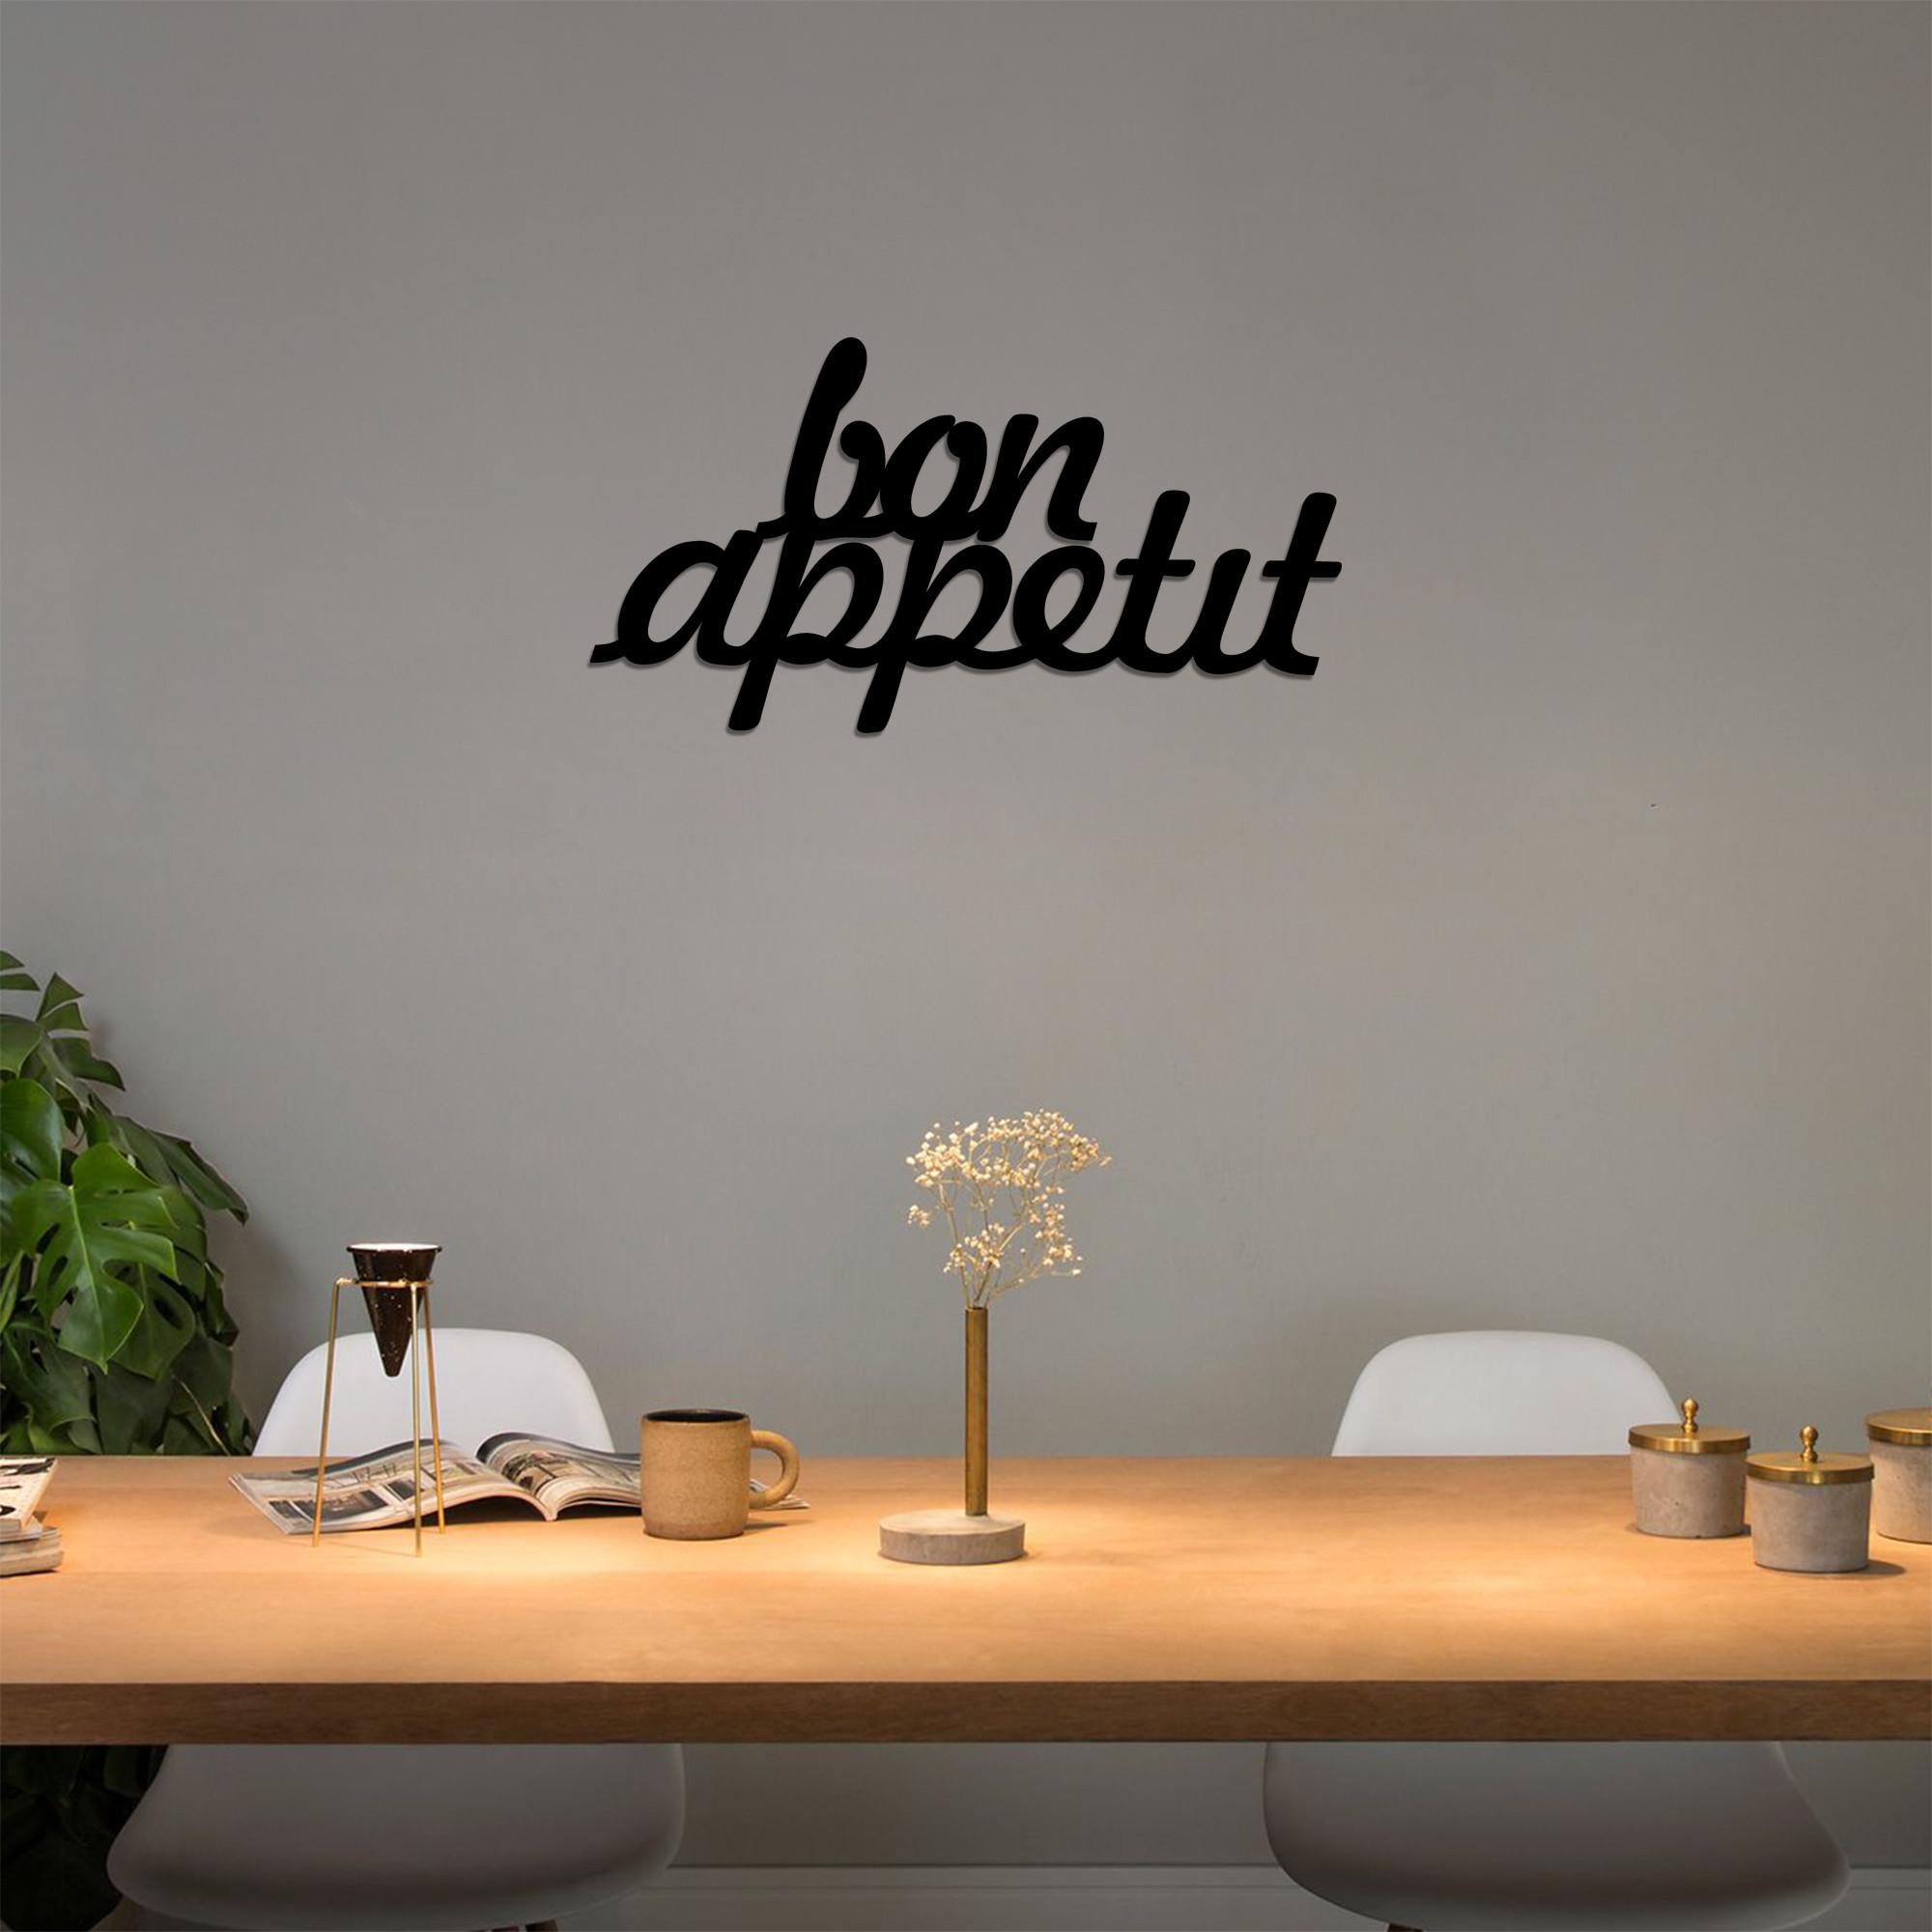 Wall Decoration Bon Appetit   Black